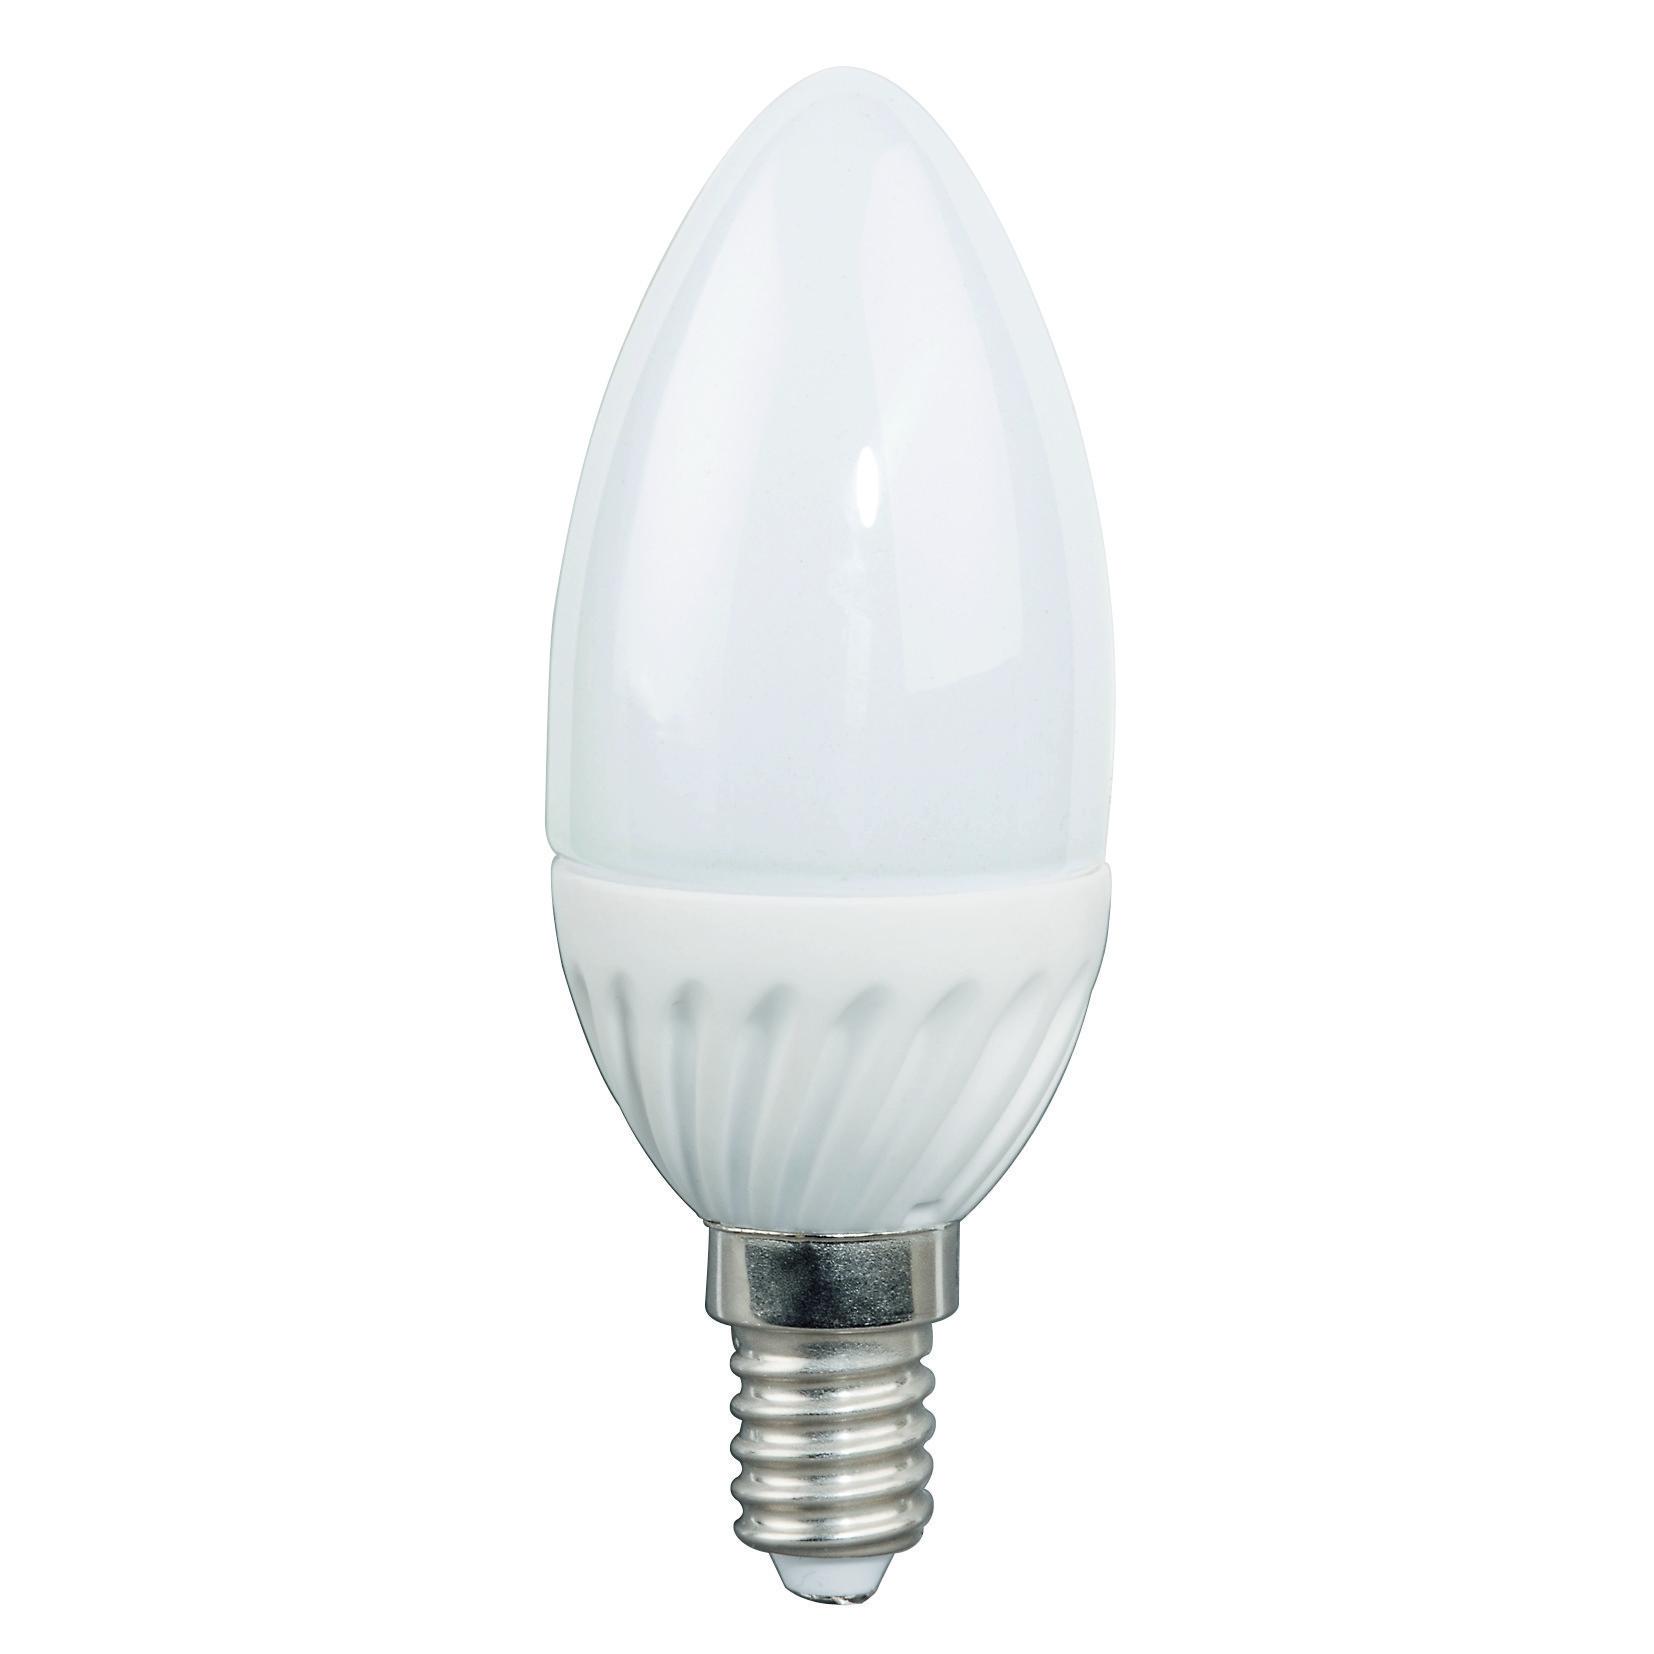 LED-Lampe / LED Leuchtmittel E14/3W 245LM Kerzenlampe warmweiß Bild 1